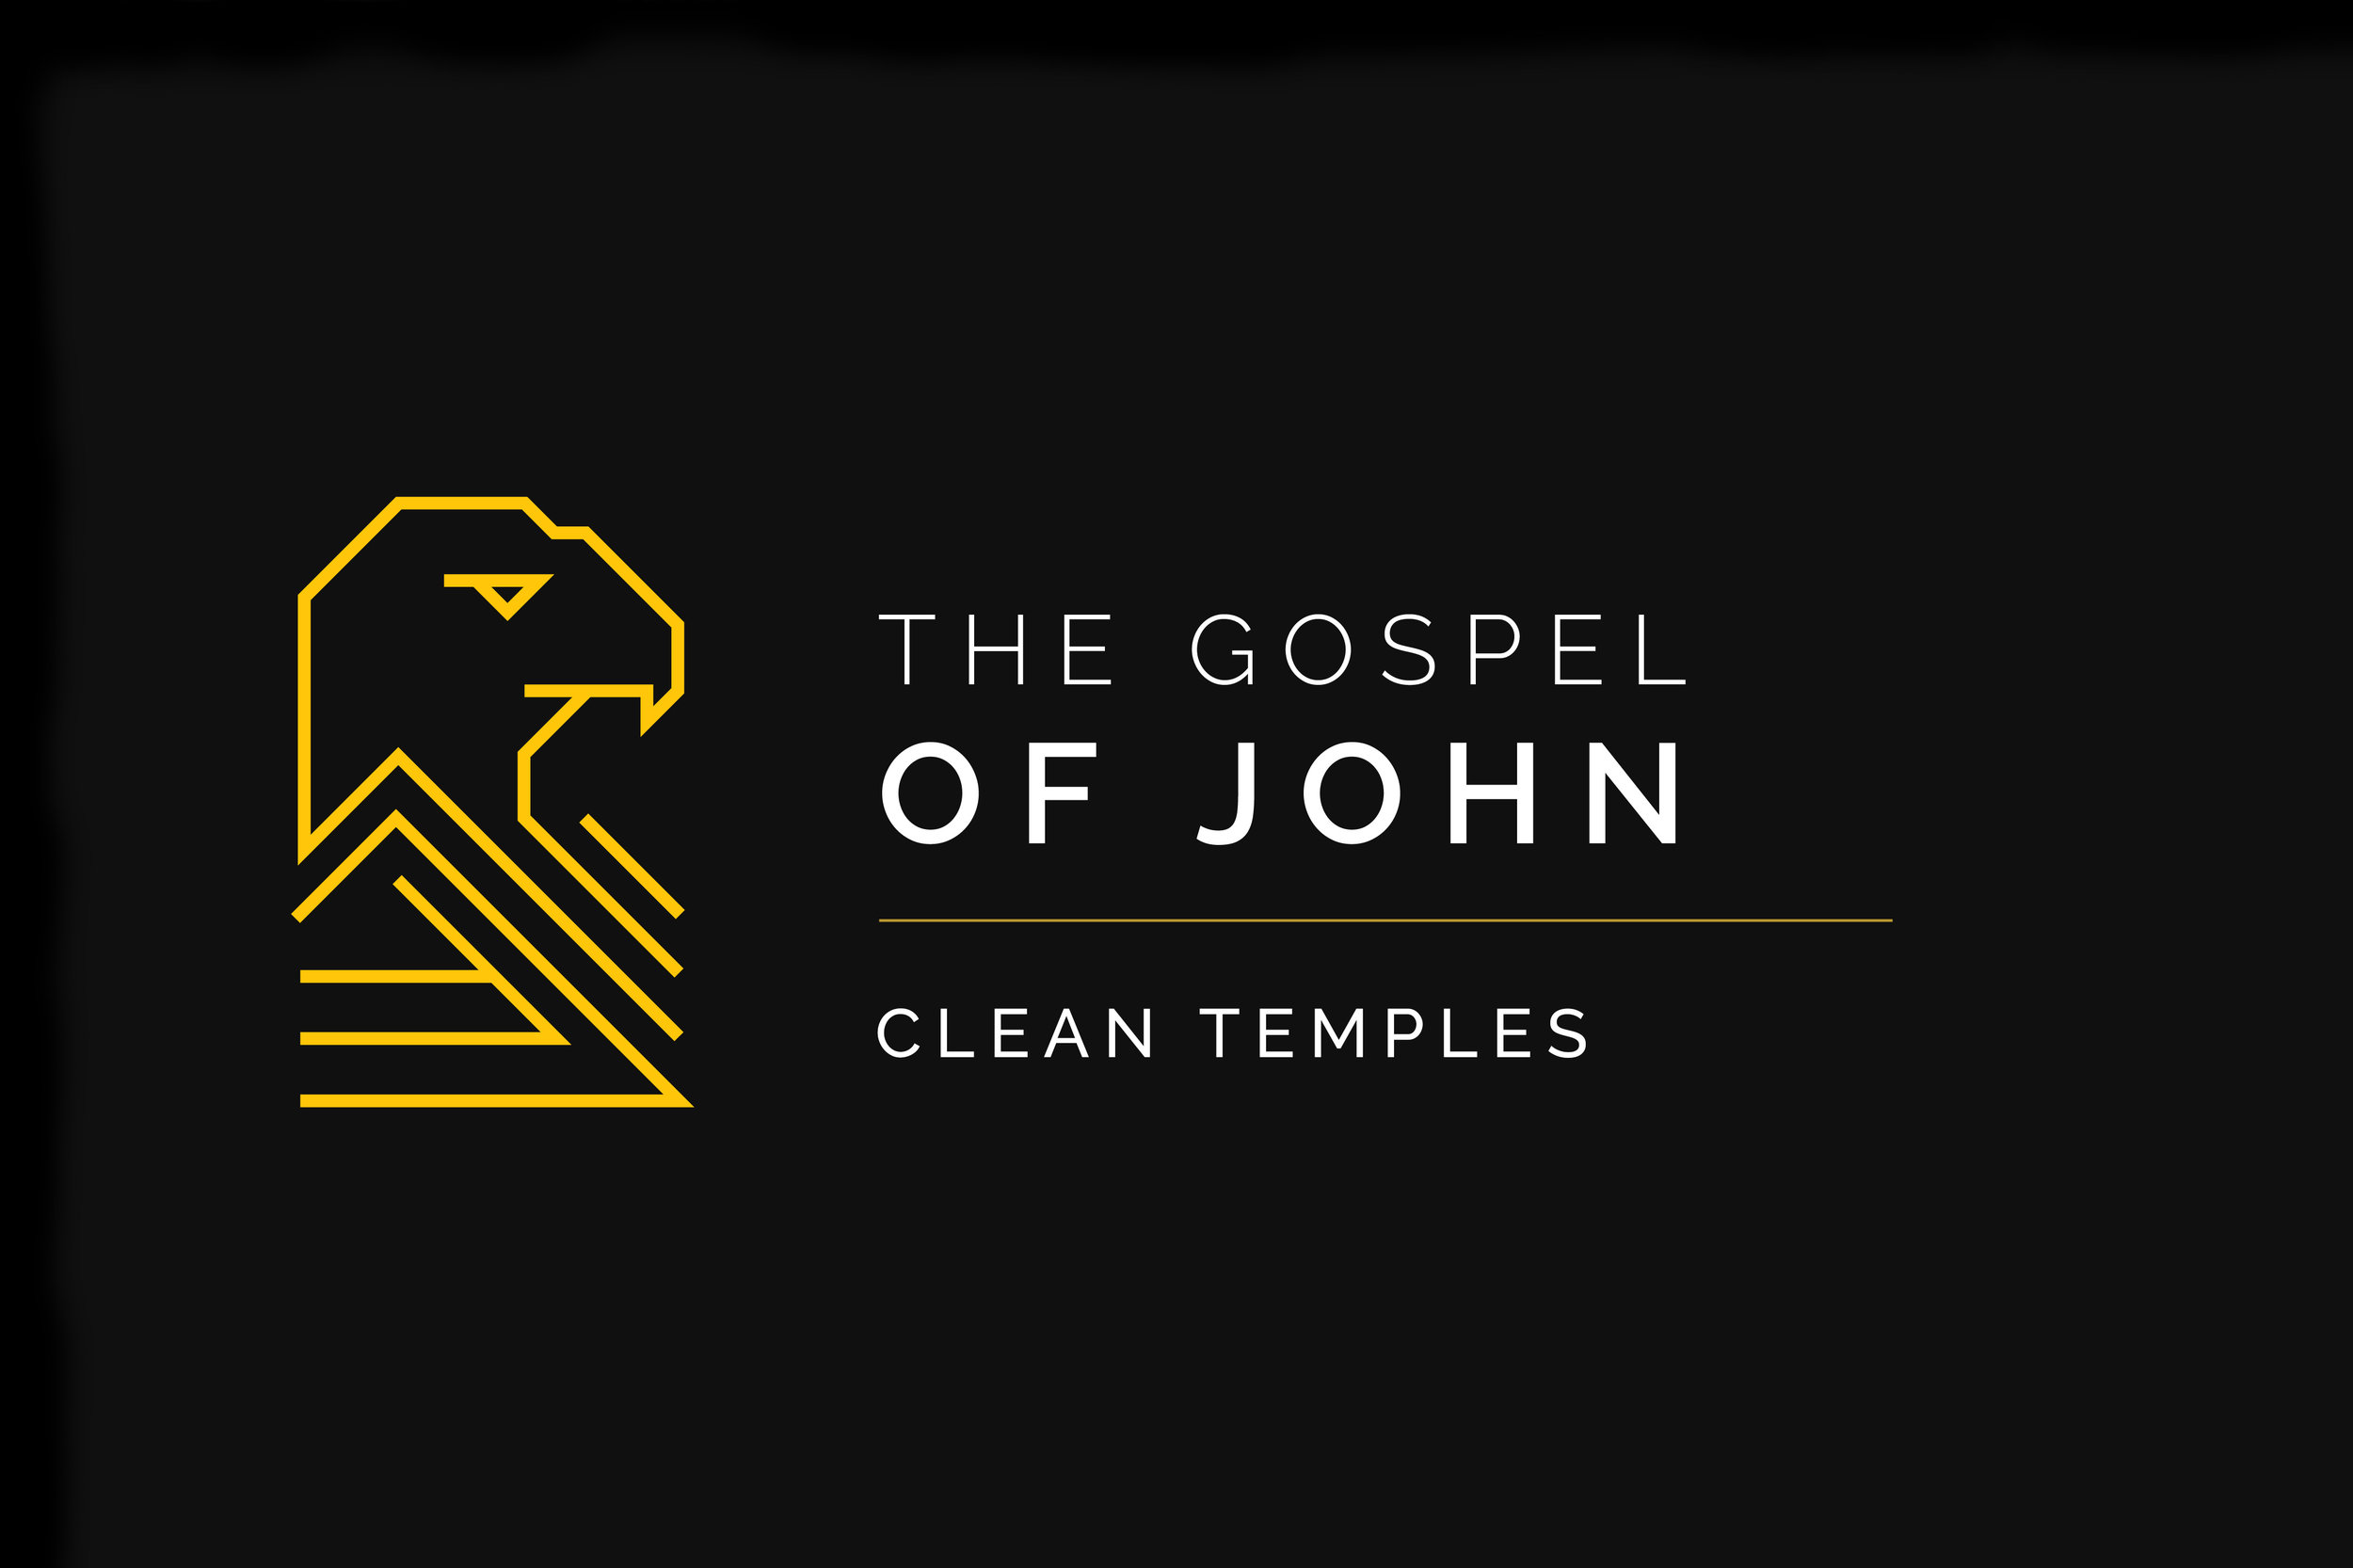 03 The-Gospel-of-John--Clean-Temples.jpg